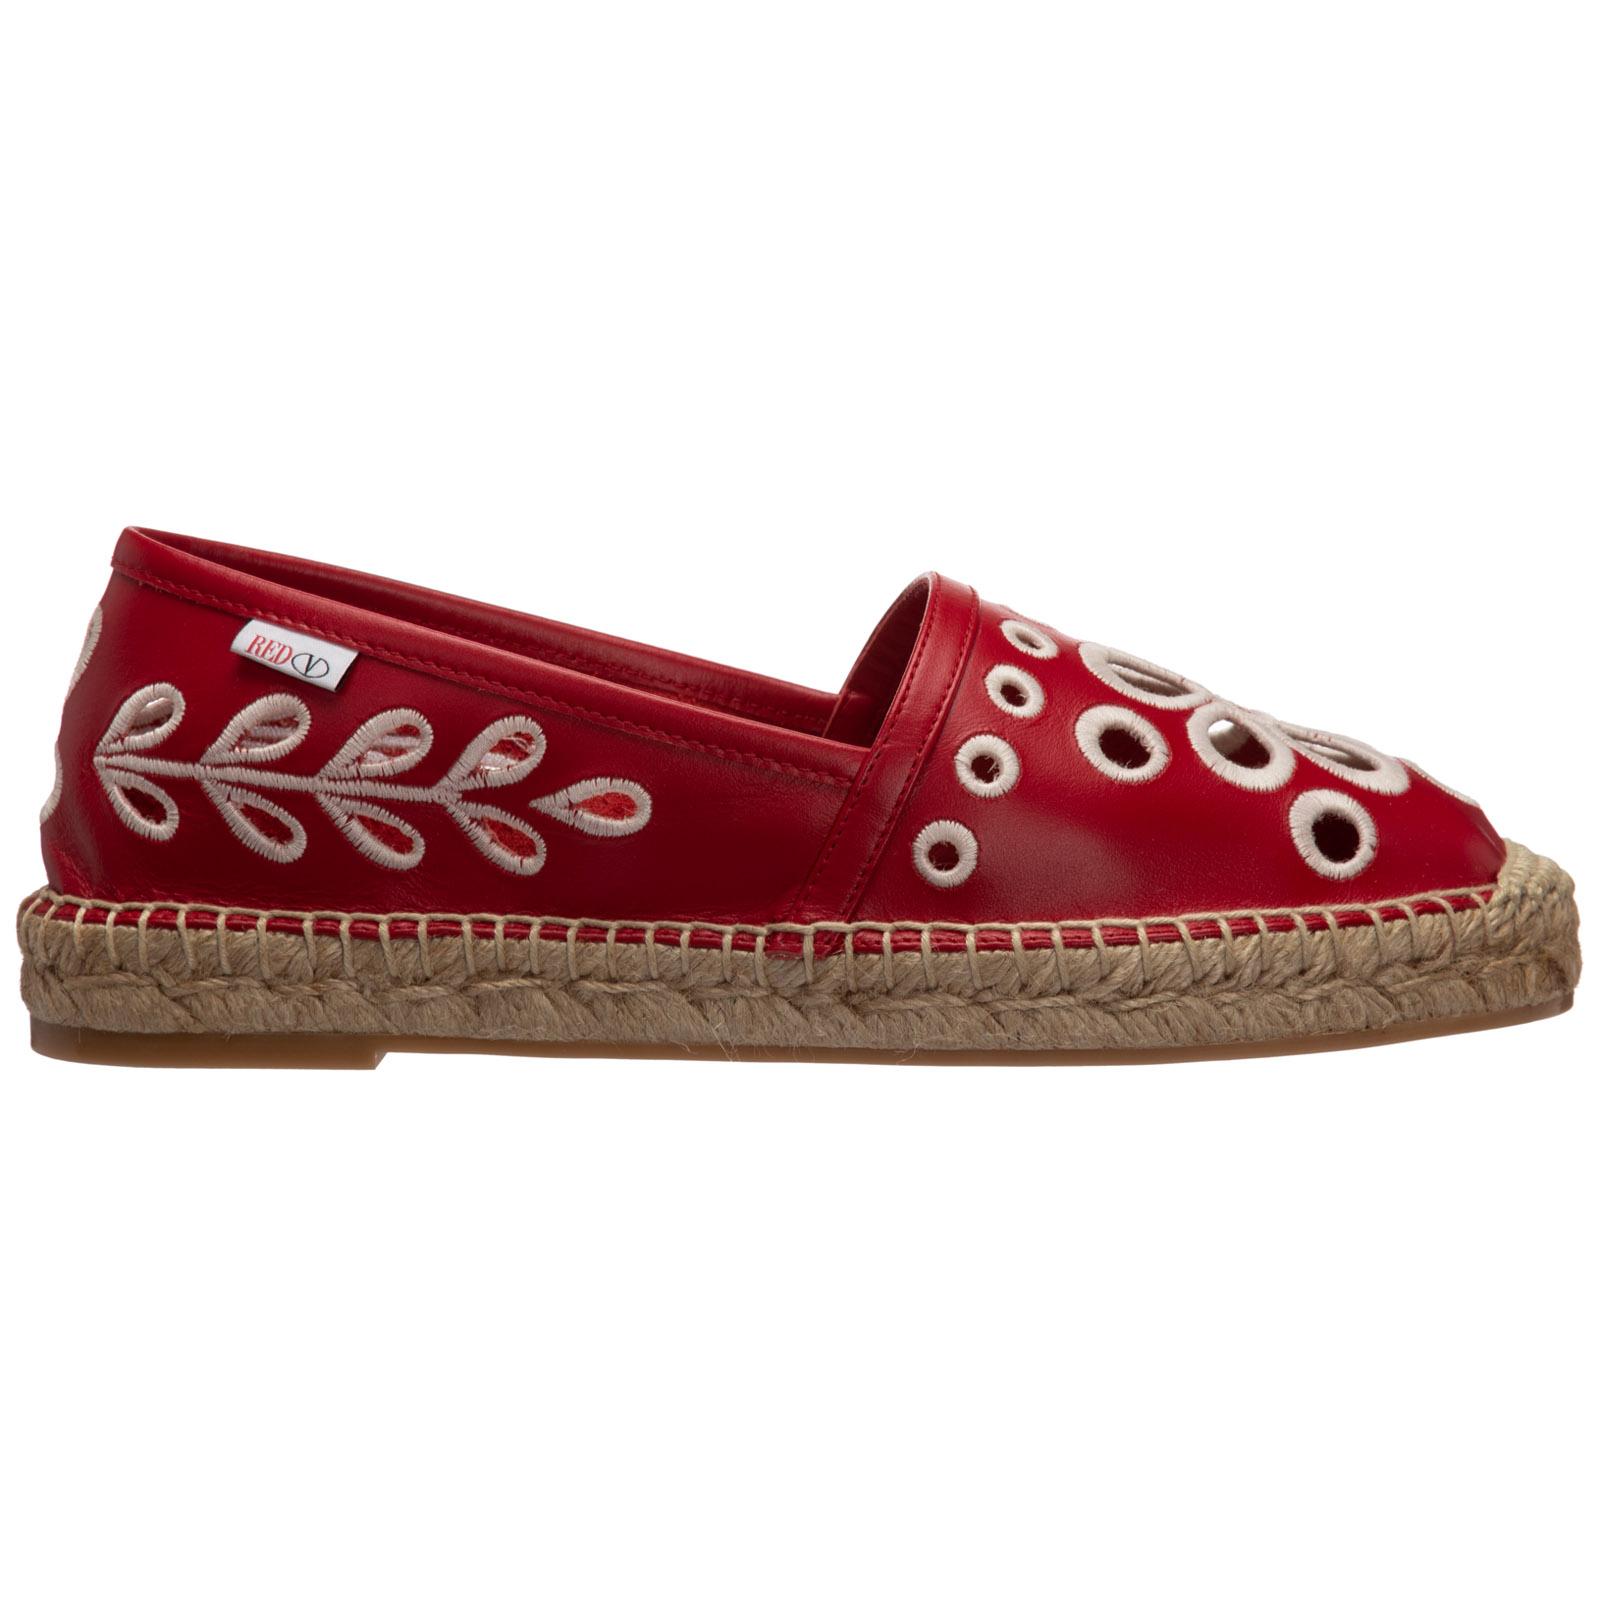 Red Valentino Espadrills WOMEN'S ESPADRILLES SLIP ON SHOES